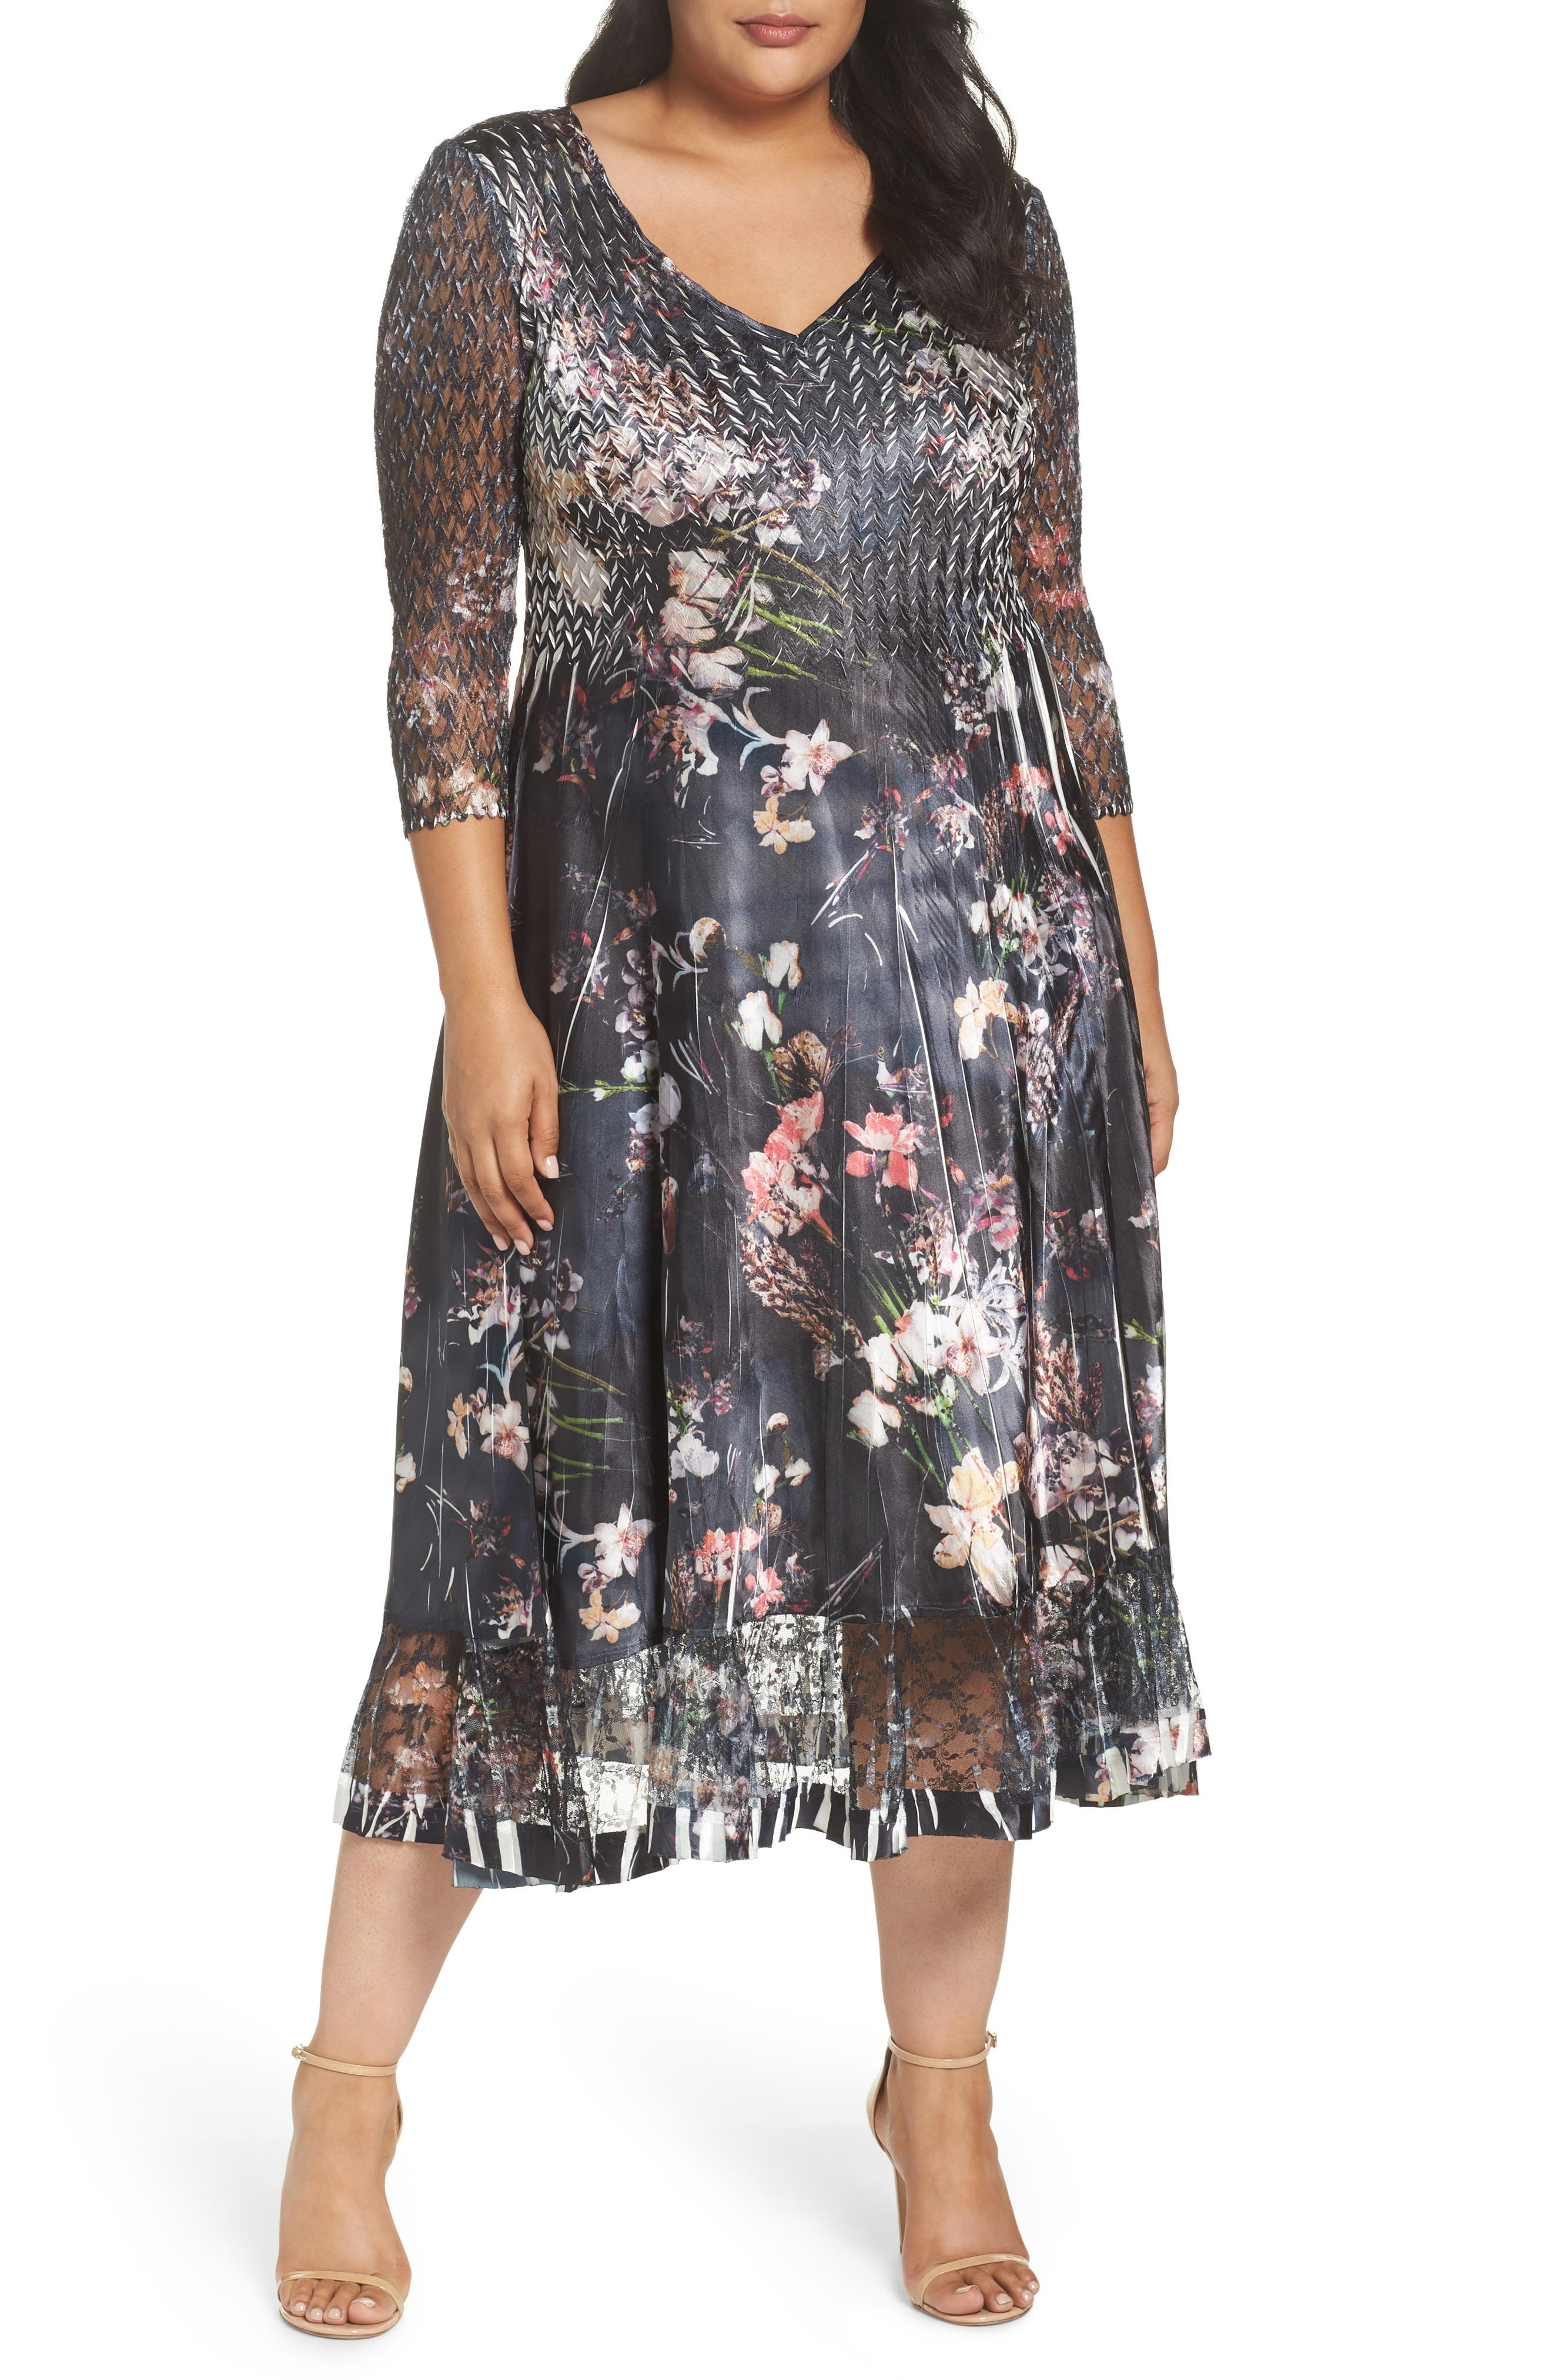 Alternate Image 1 Selected - Komarov Lace Inset Floral Chiffon A-Line Dress (Plus Size)